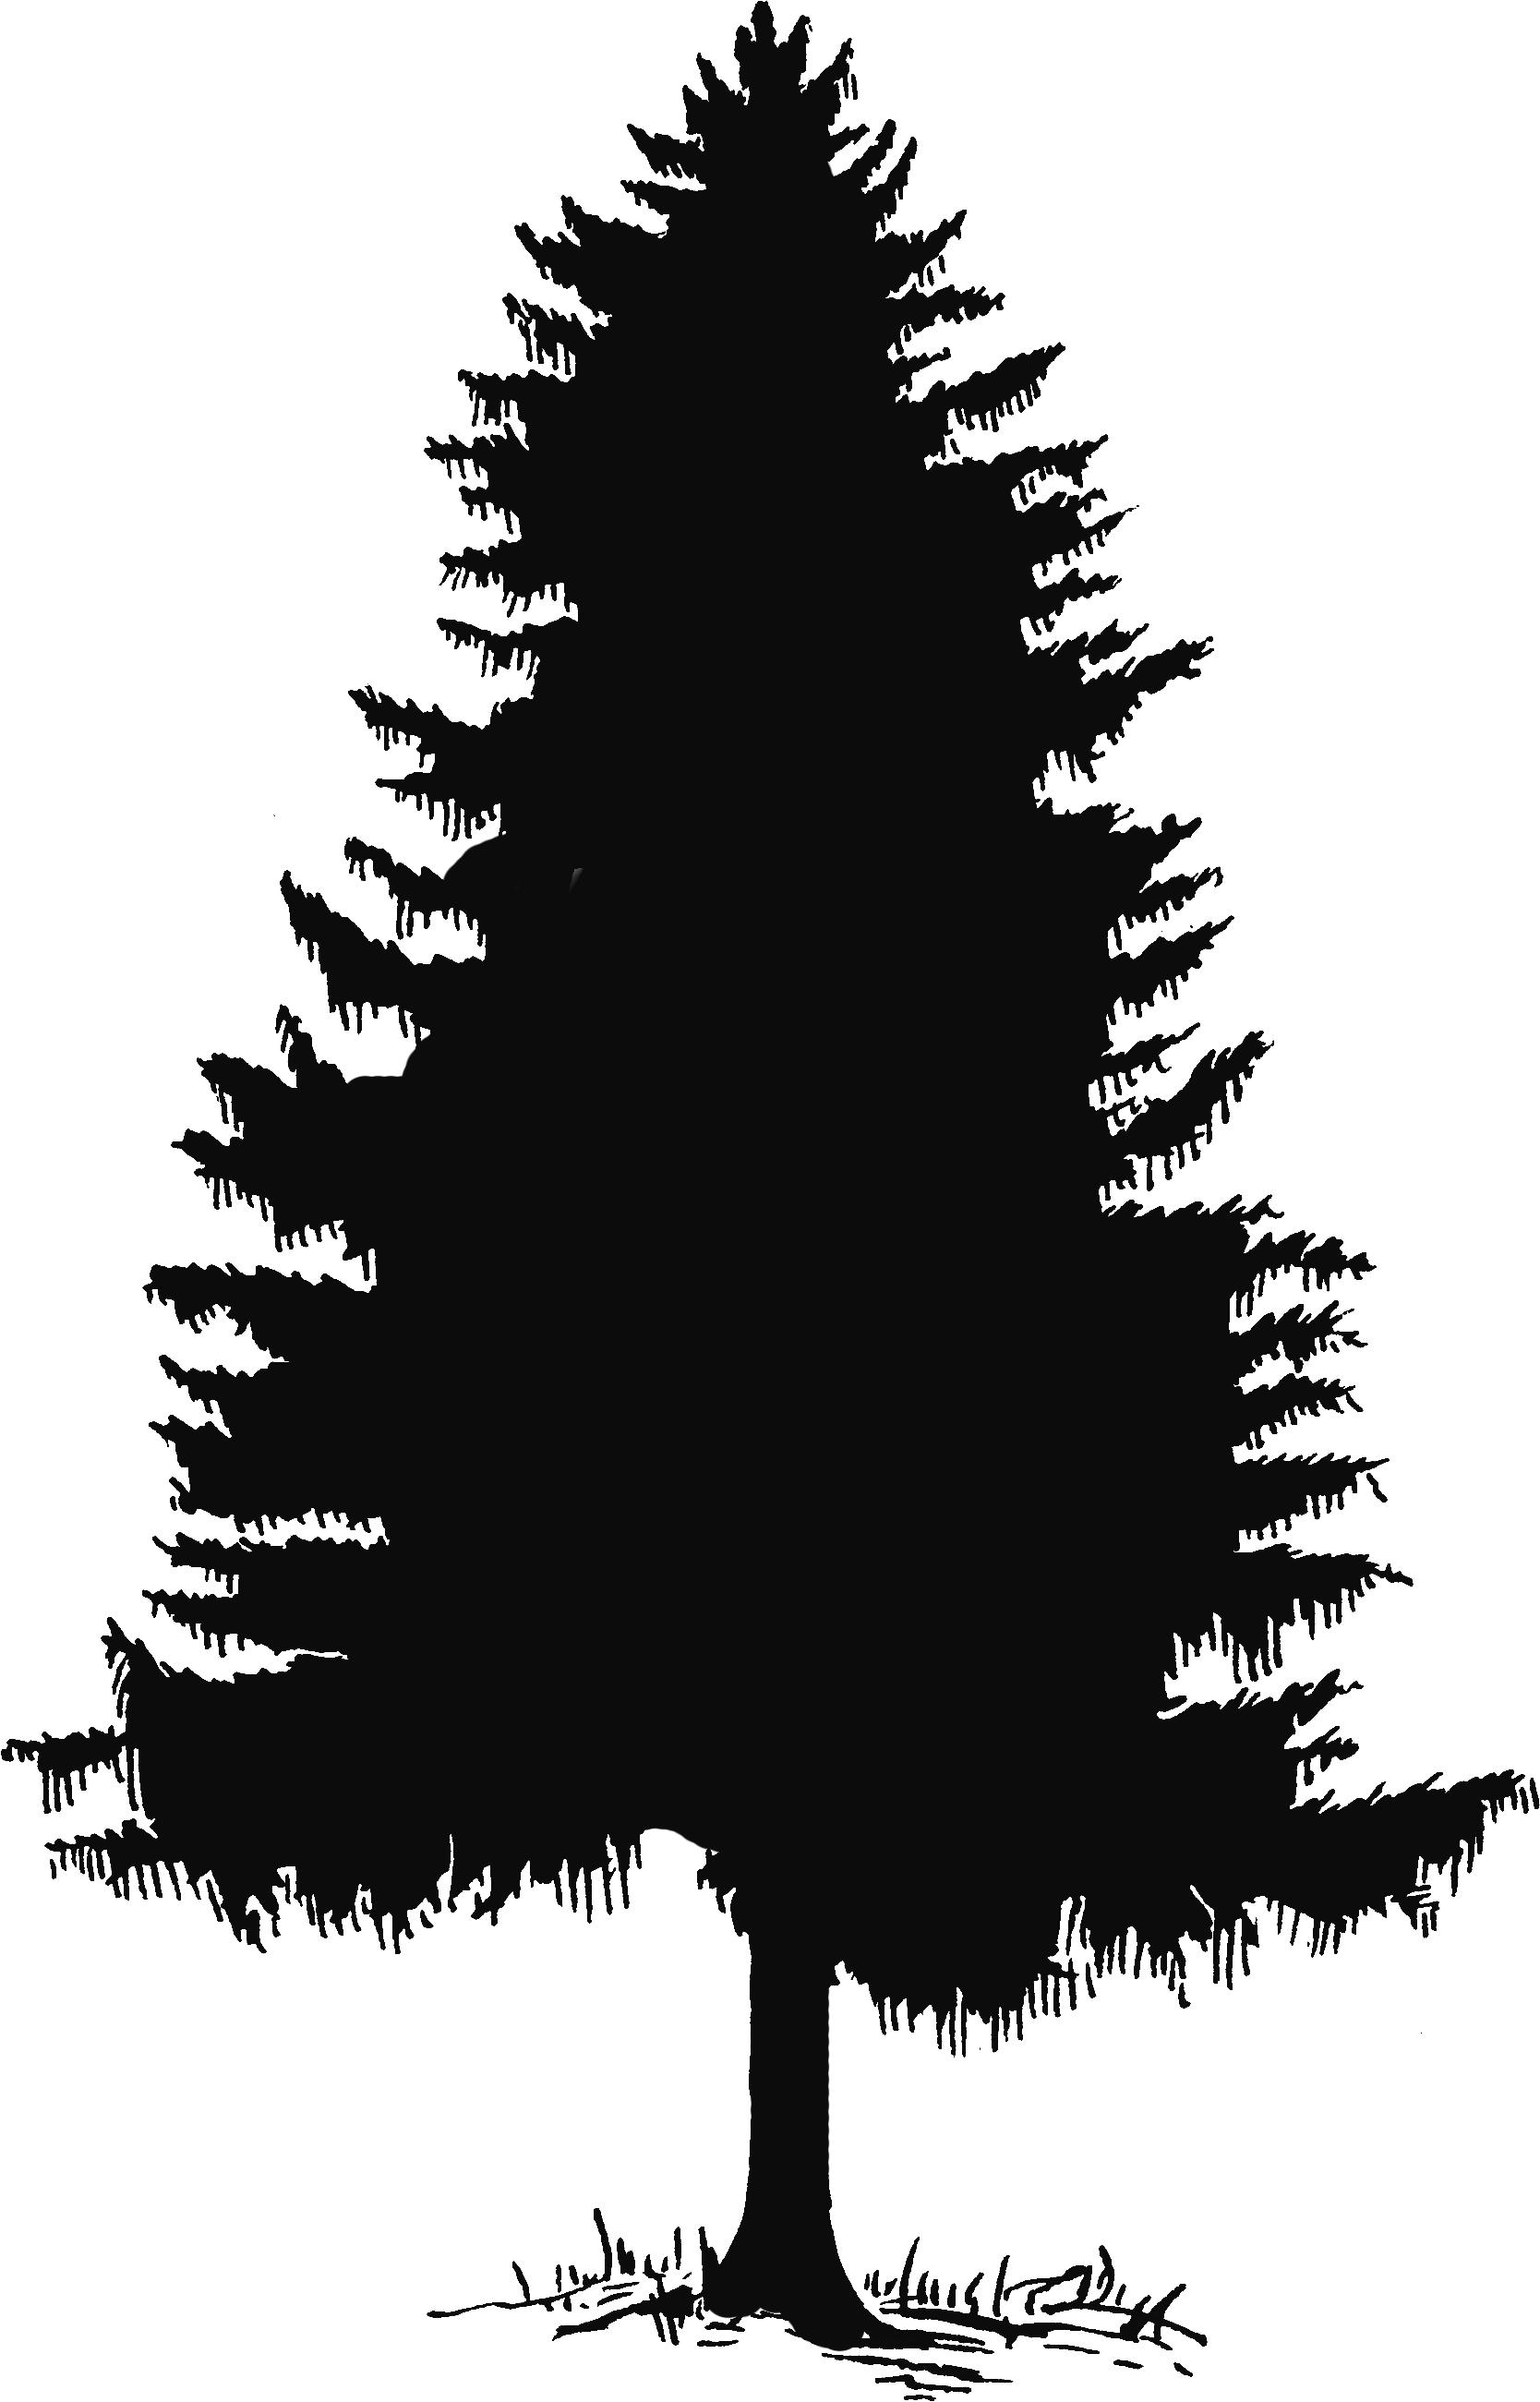 Pine Tree Tree Silhouette And Clip Art On 2 Pine Tree Silhouette Silhouette Clip Art Tree Silhouette